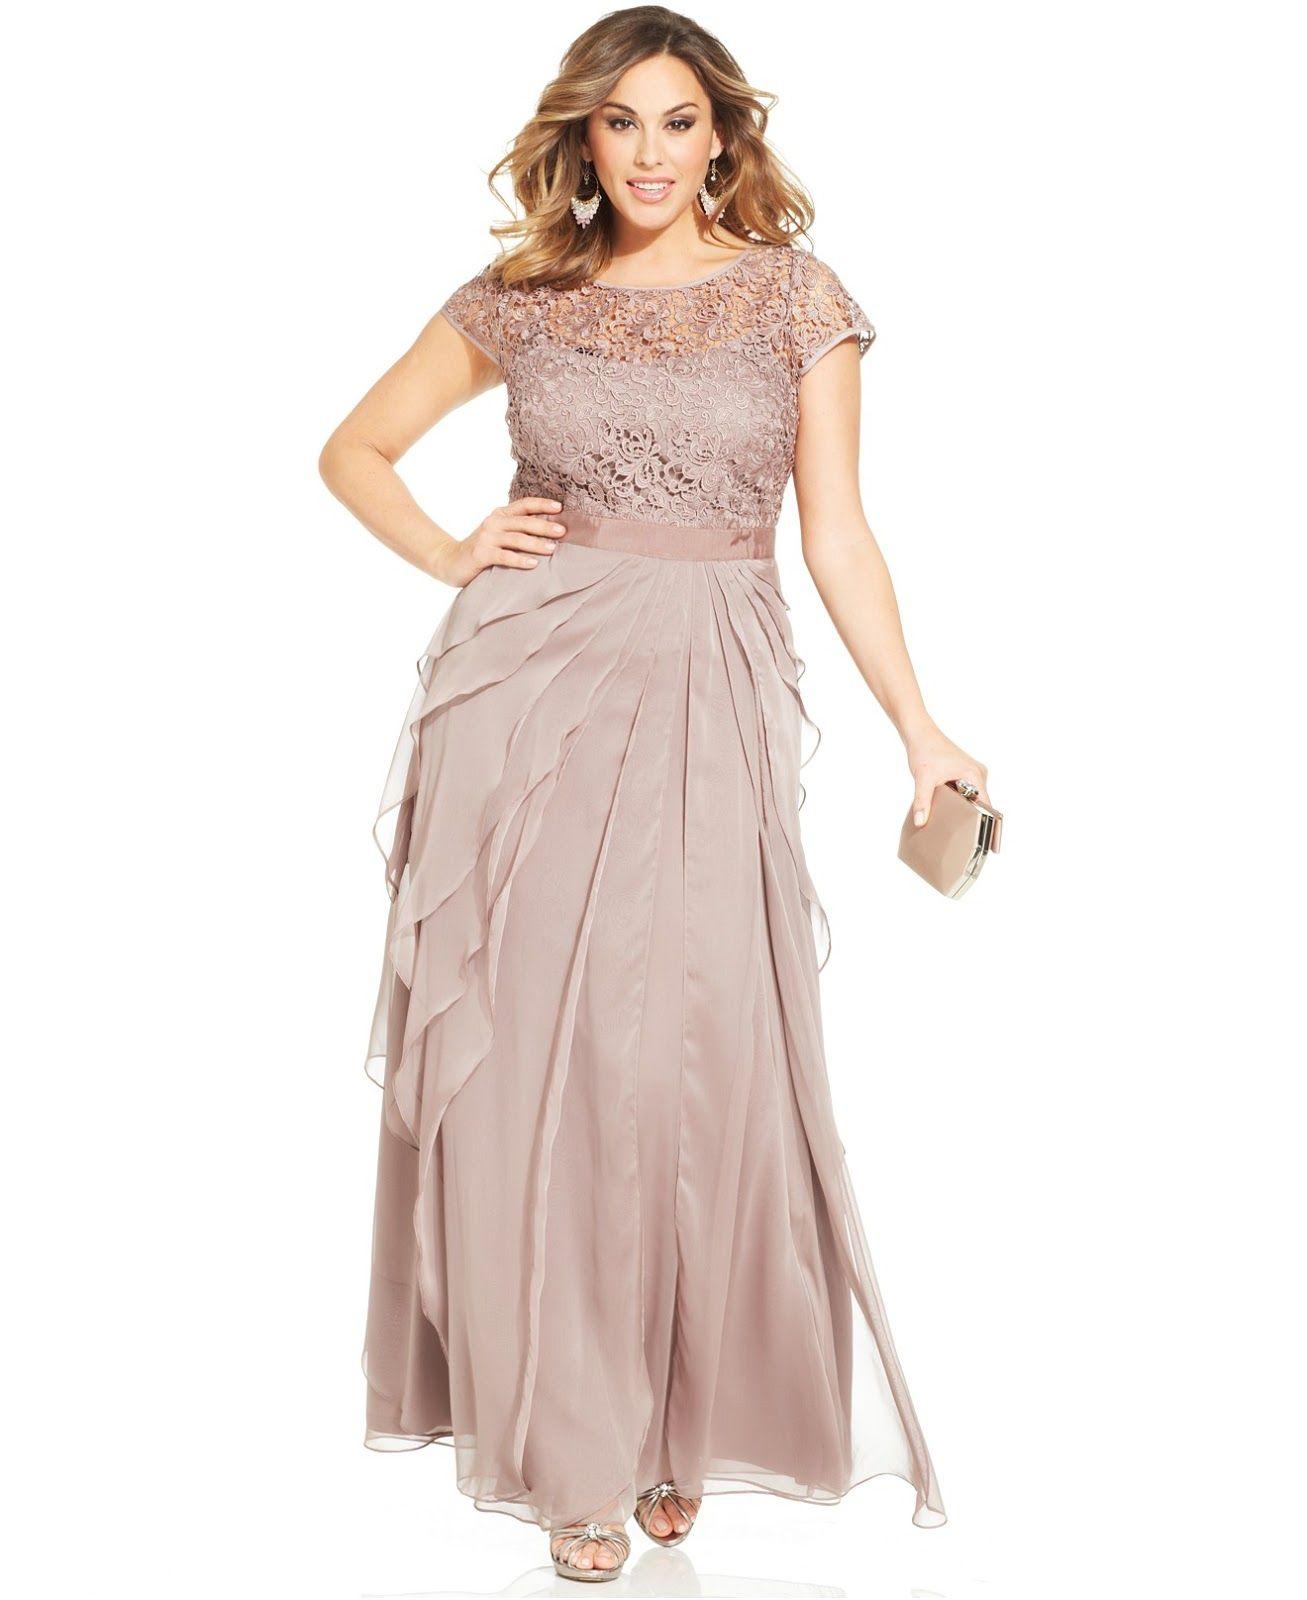 4d1903ae5f2 Vestidos para gorditas elegantes ¡MARAVILLOSAS TENDENCIA EN OUTFITS ...